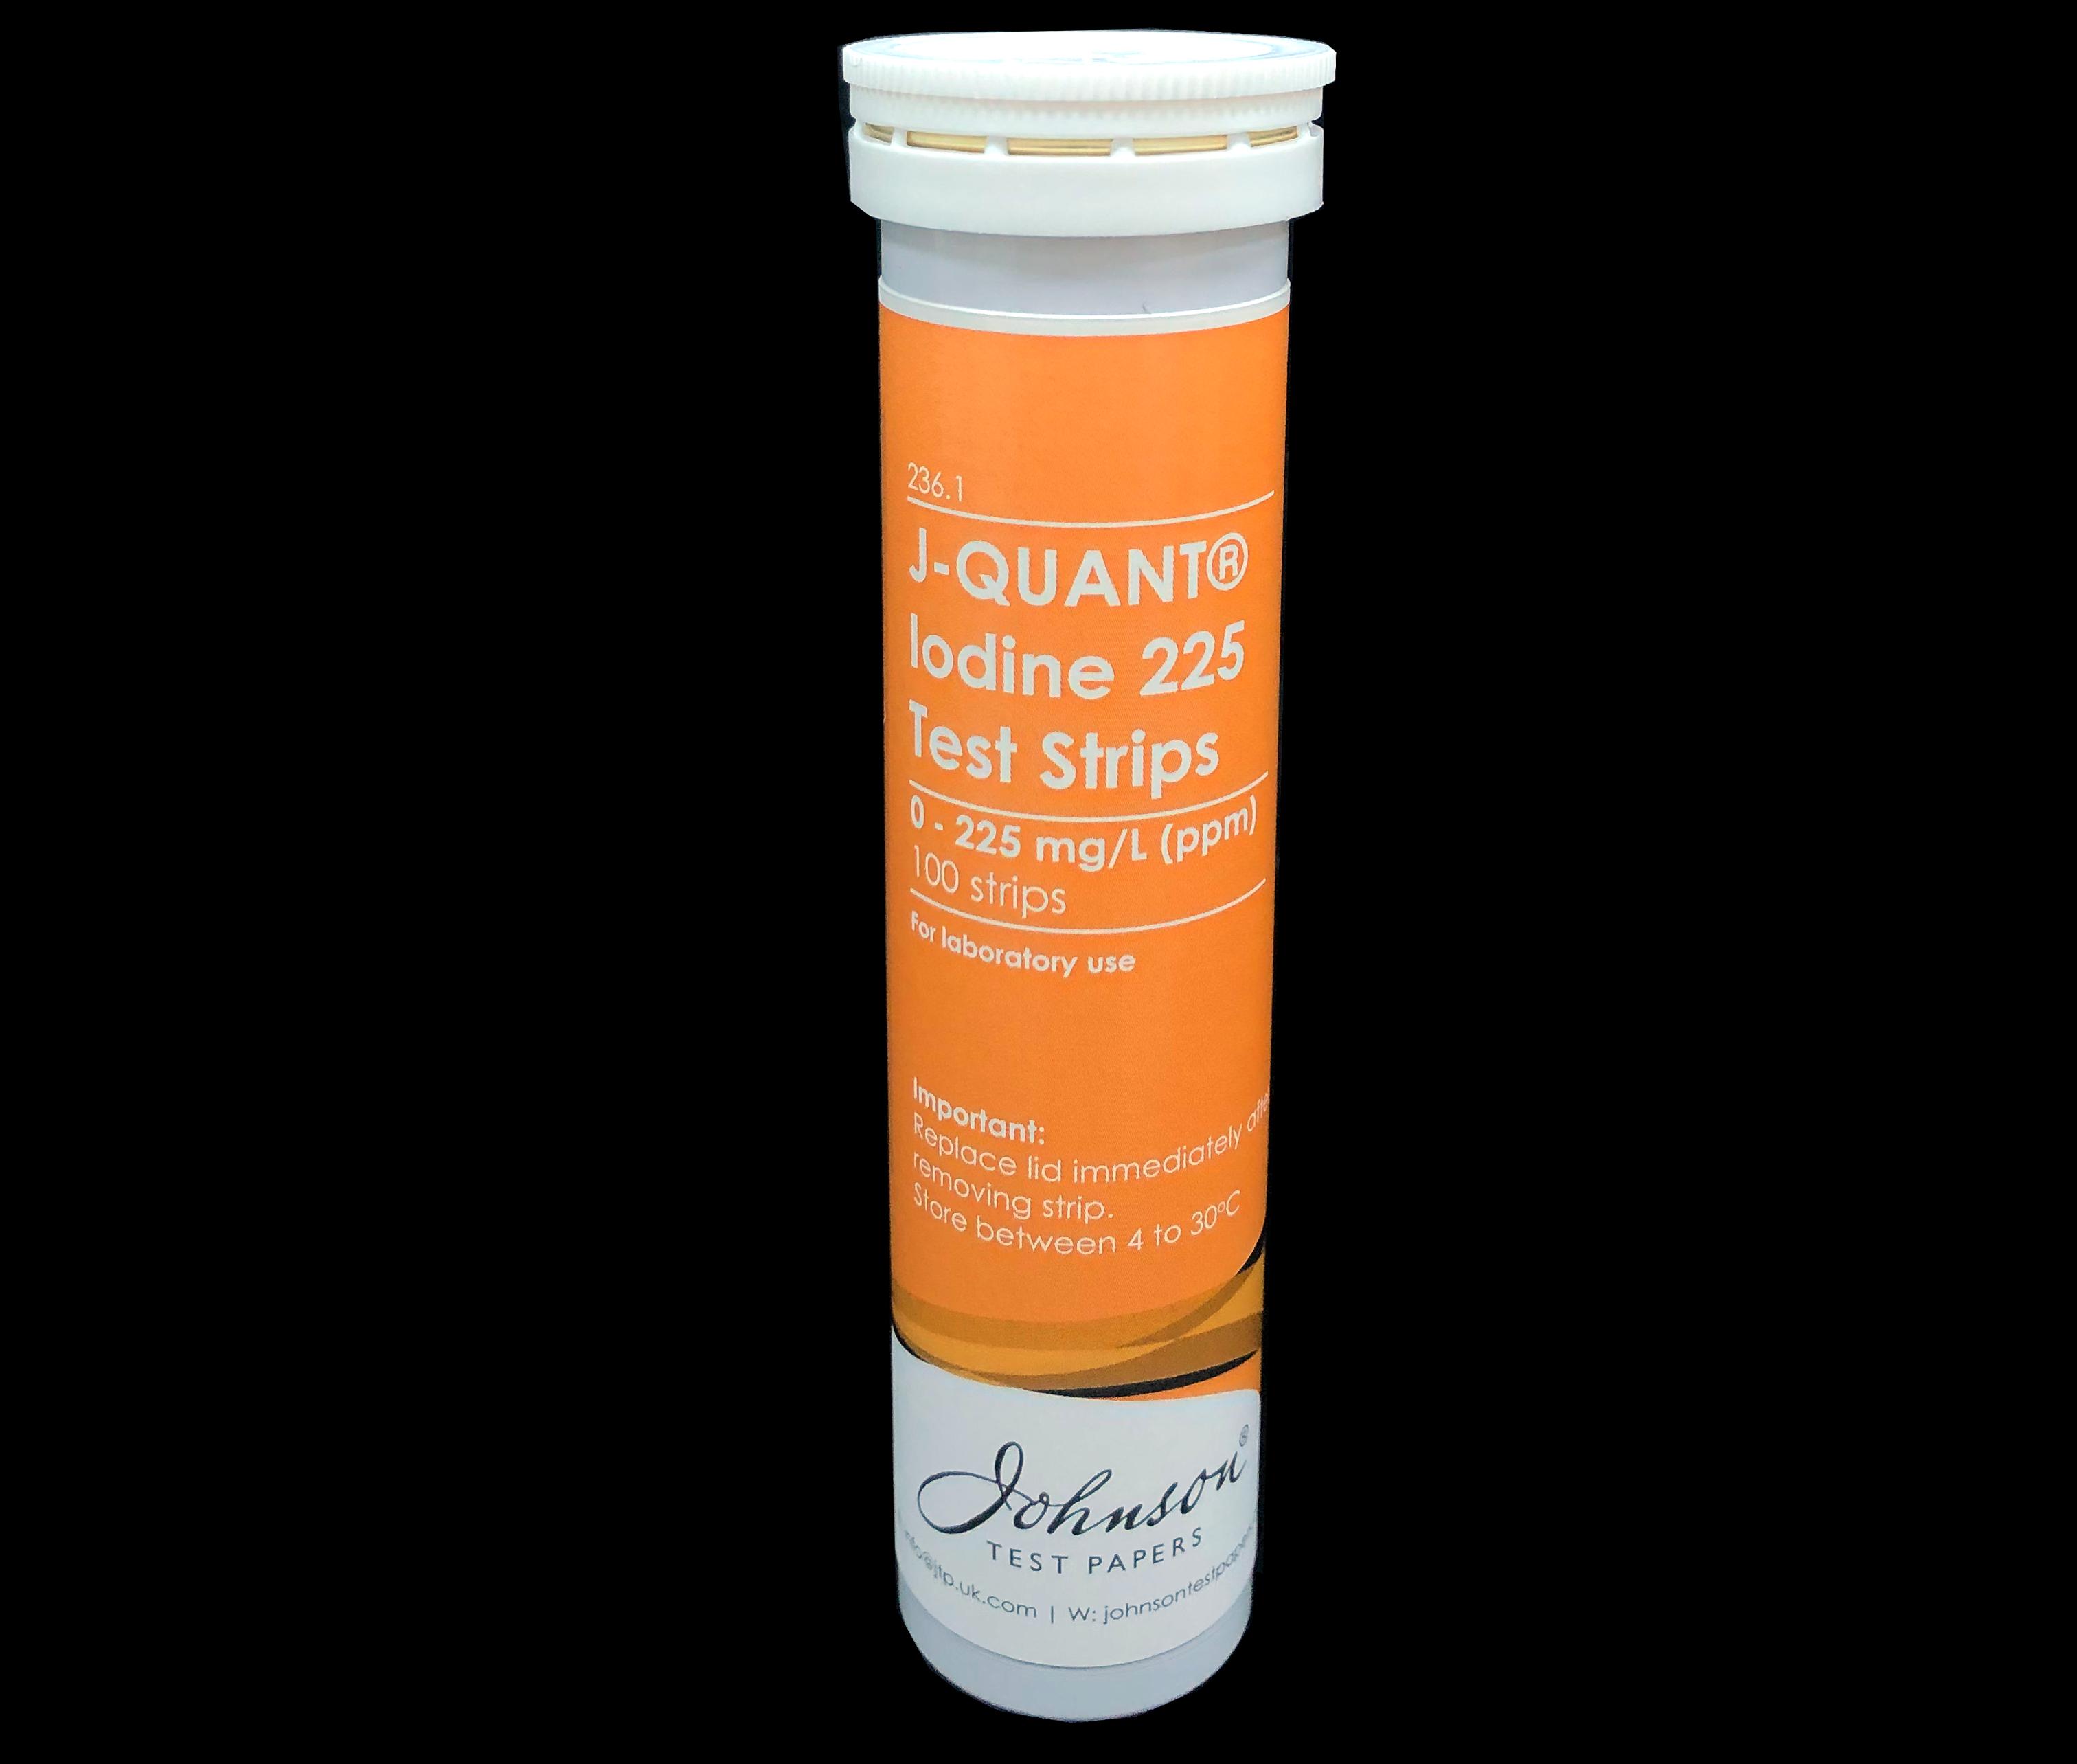 J-QUANT<sup>®</sup> Iodine